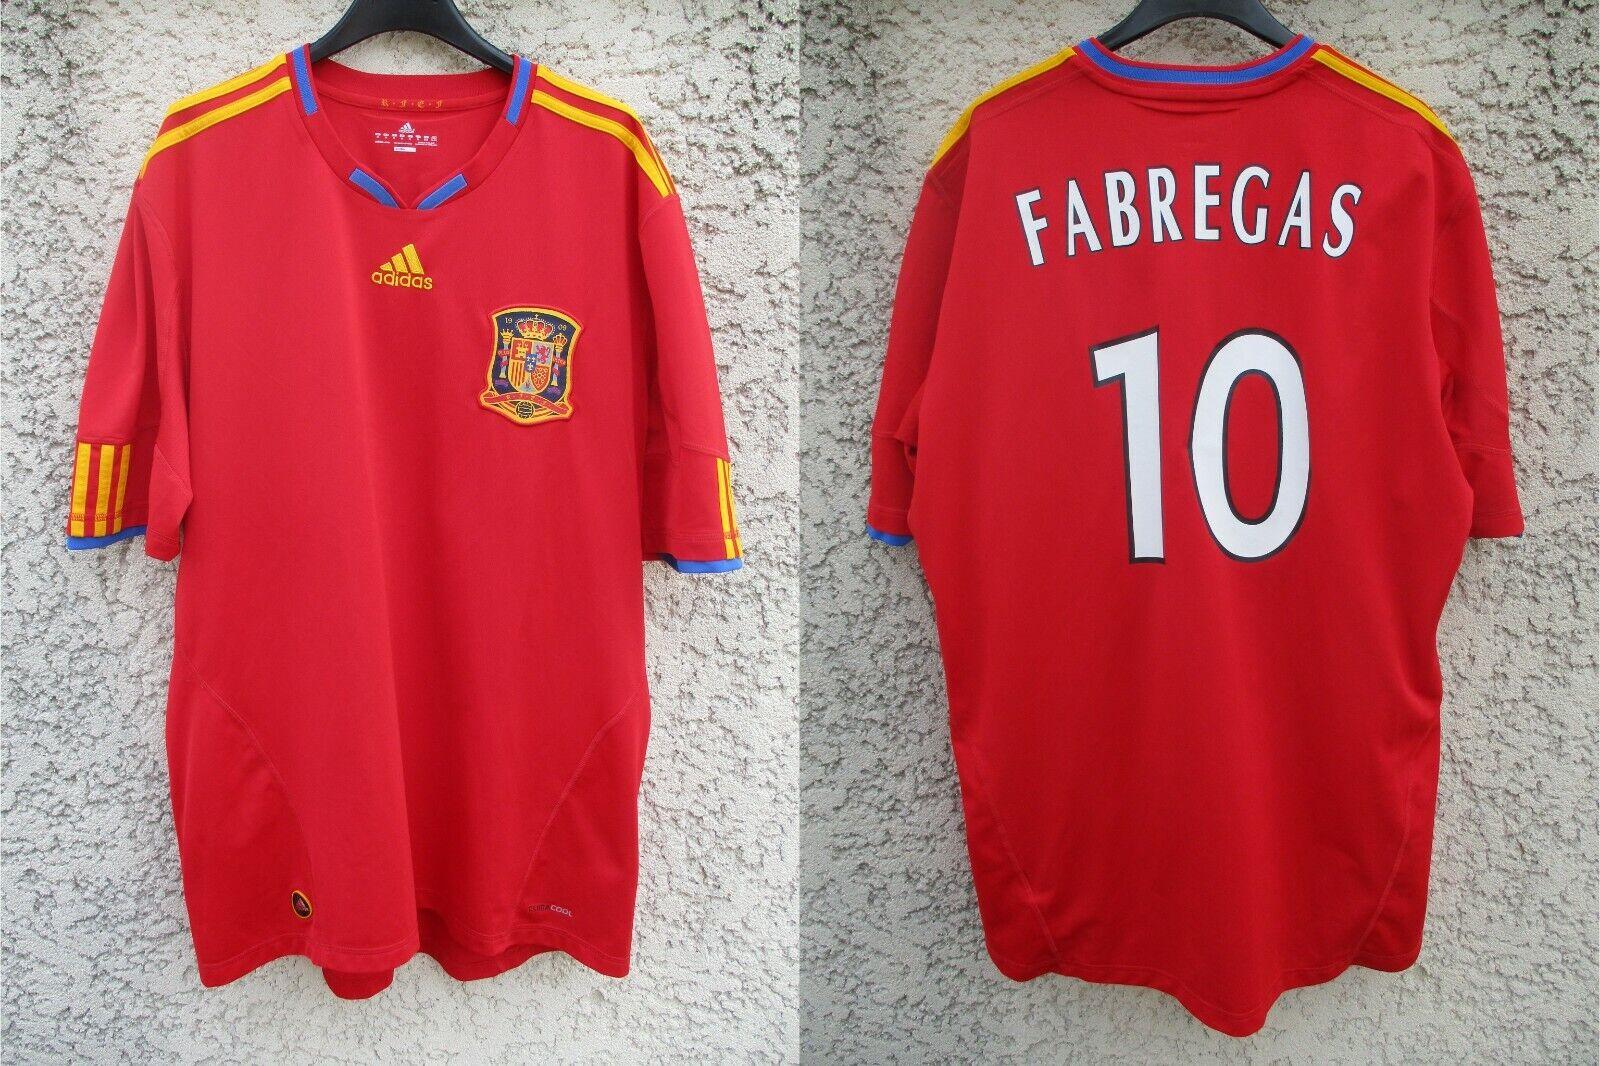 Maillot ESPAGNE ESPANA FABREGAS camiseta Copa Del Mundo ADIDAS World Cup 2010 XL